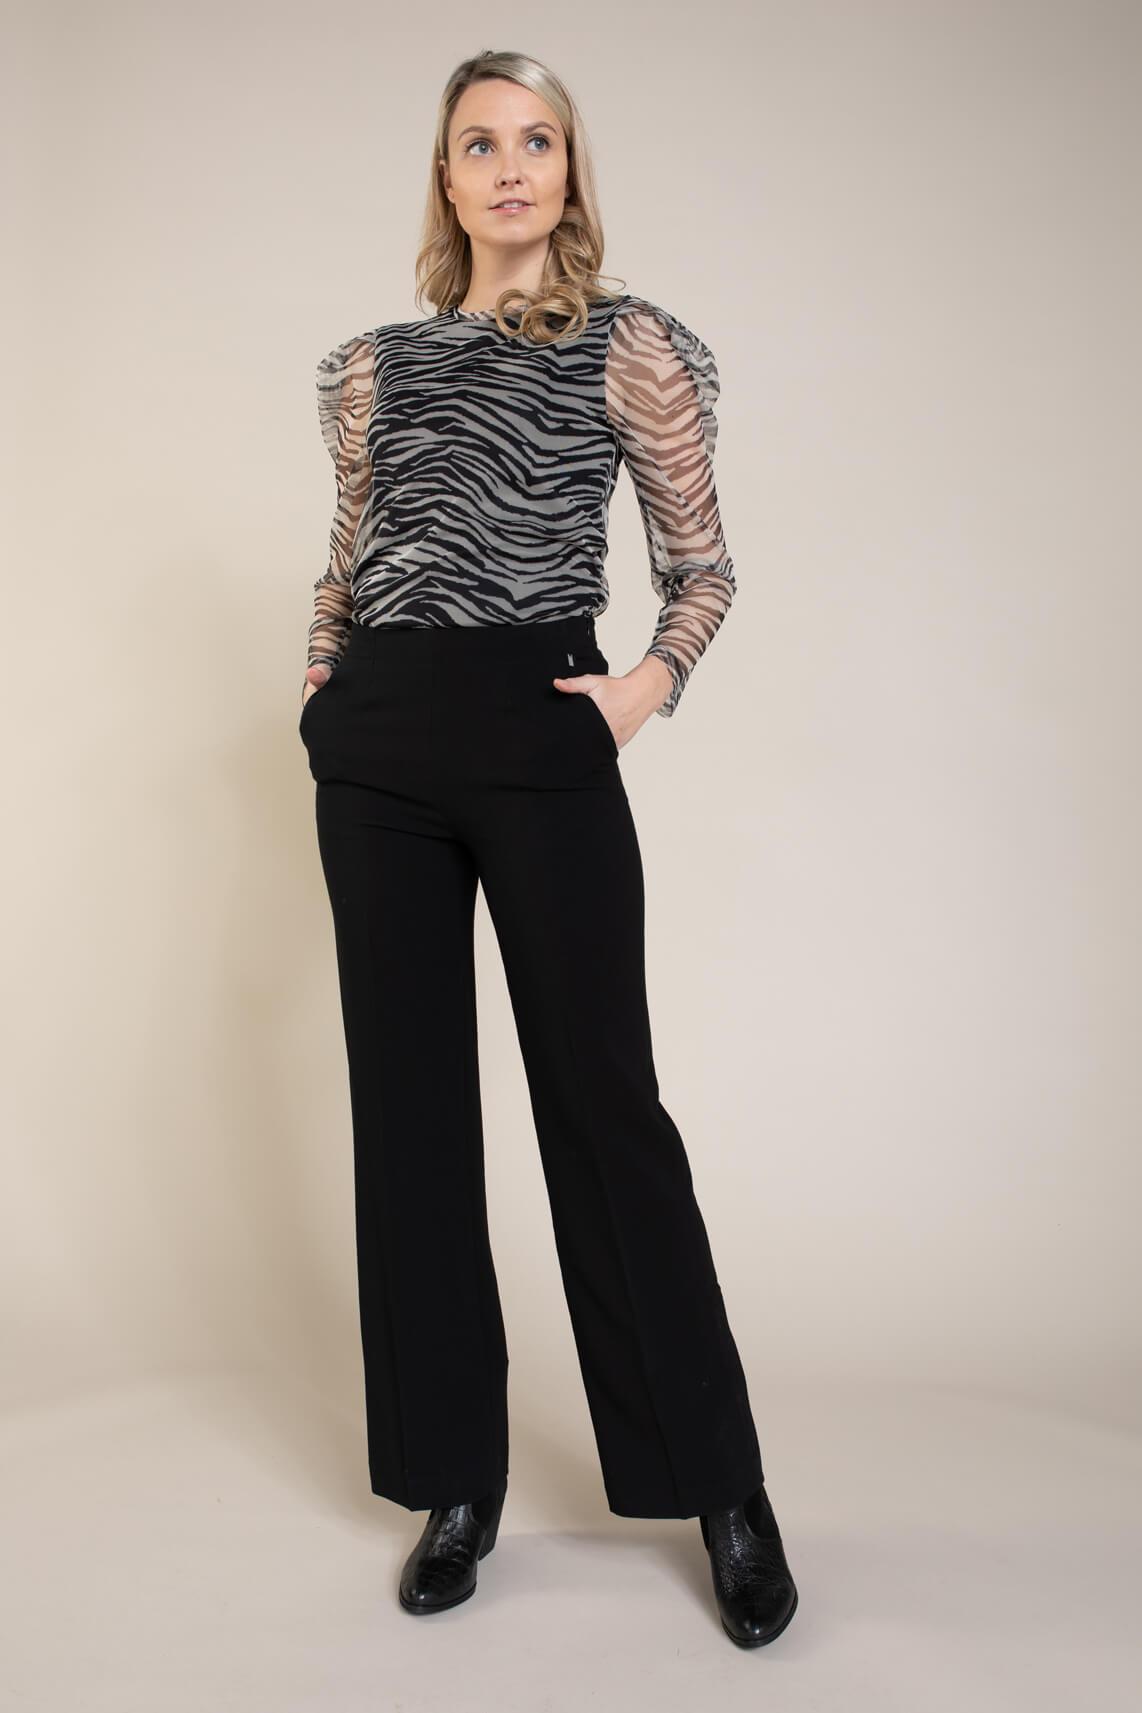 Anna Dames Wijde pantalon zwart